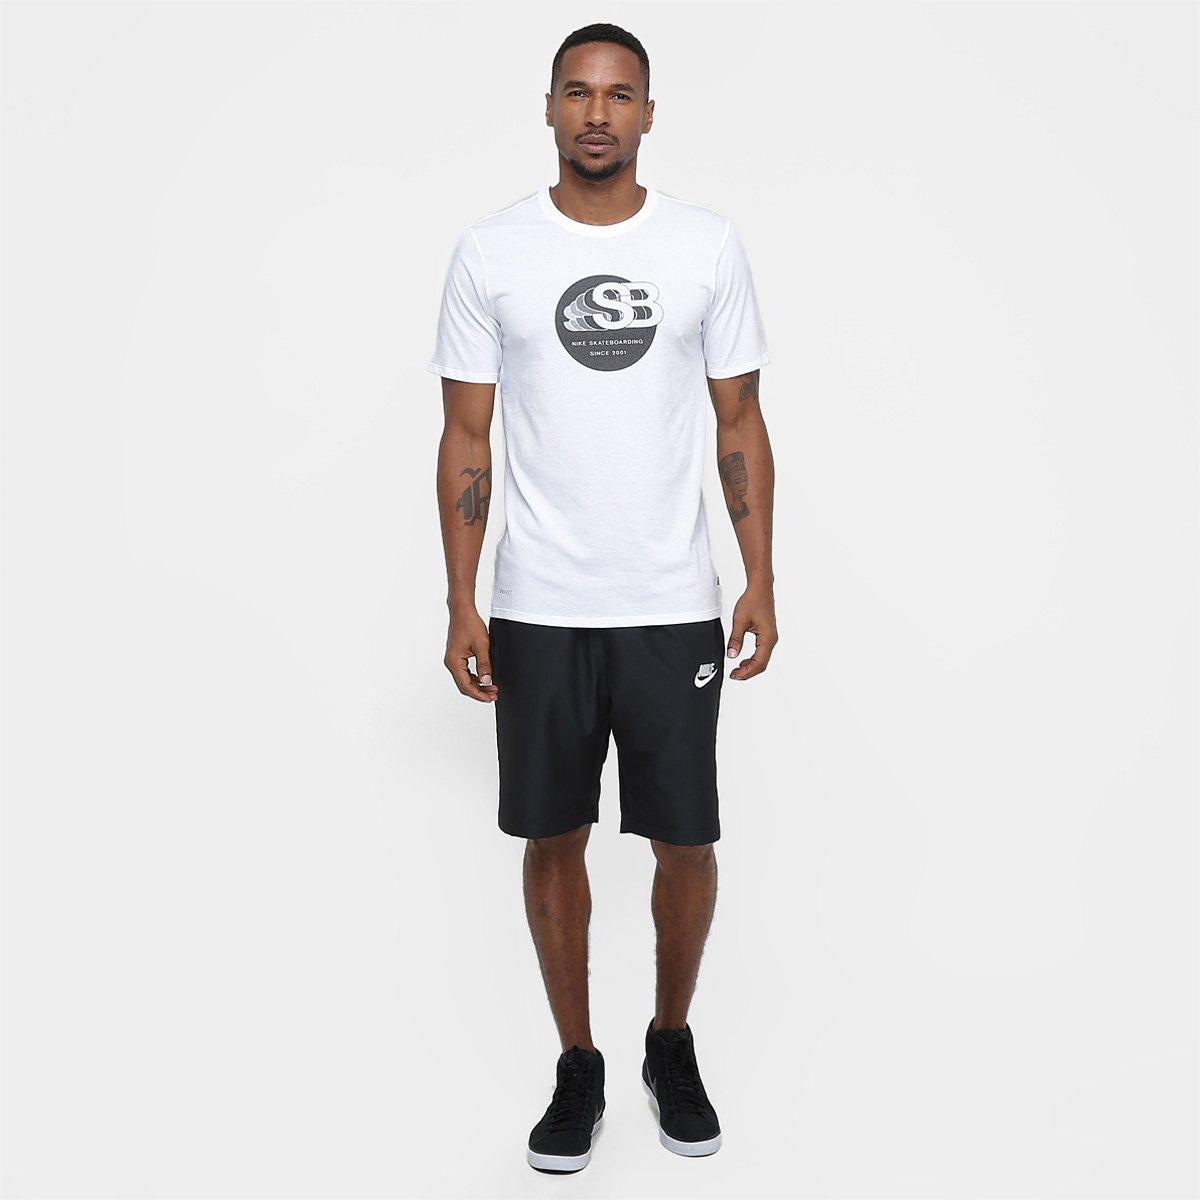 45cc3dcf24 Camiseta Nike SB Dry Tee Df Ta  17 - Compre Agora